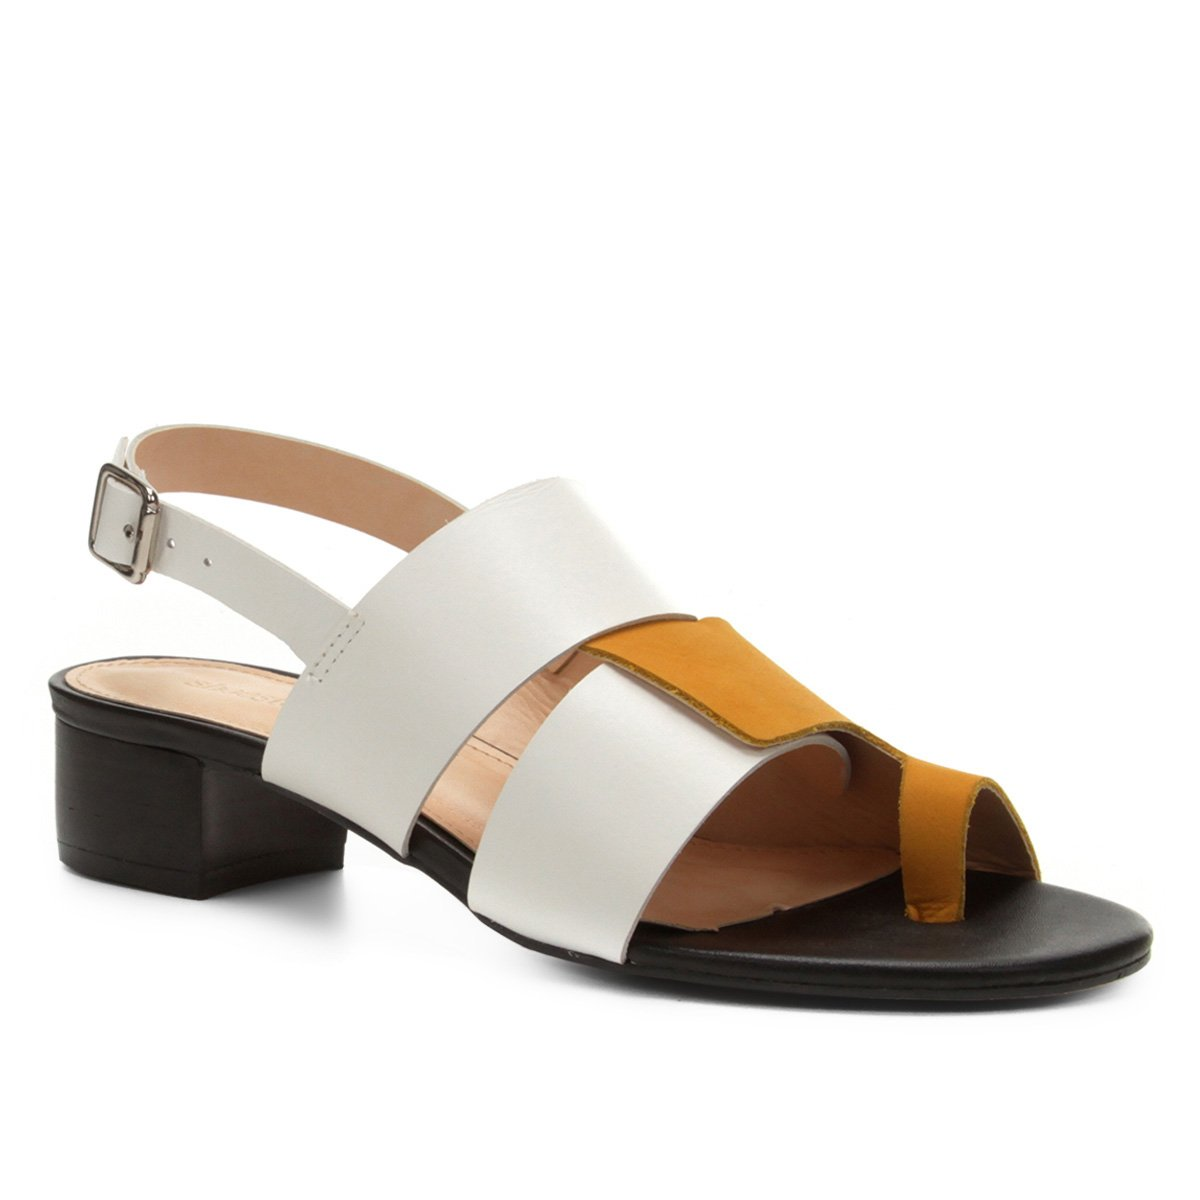 2c23a6834 Sandália Couro Shoestock Salto Bloco Color Mix Feminina - Amarelo |  Shoestock